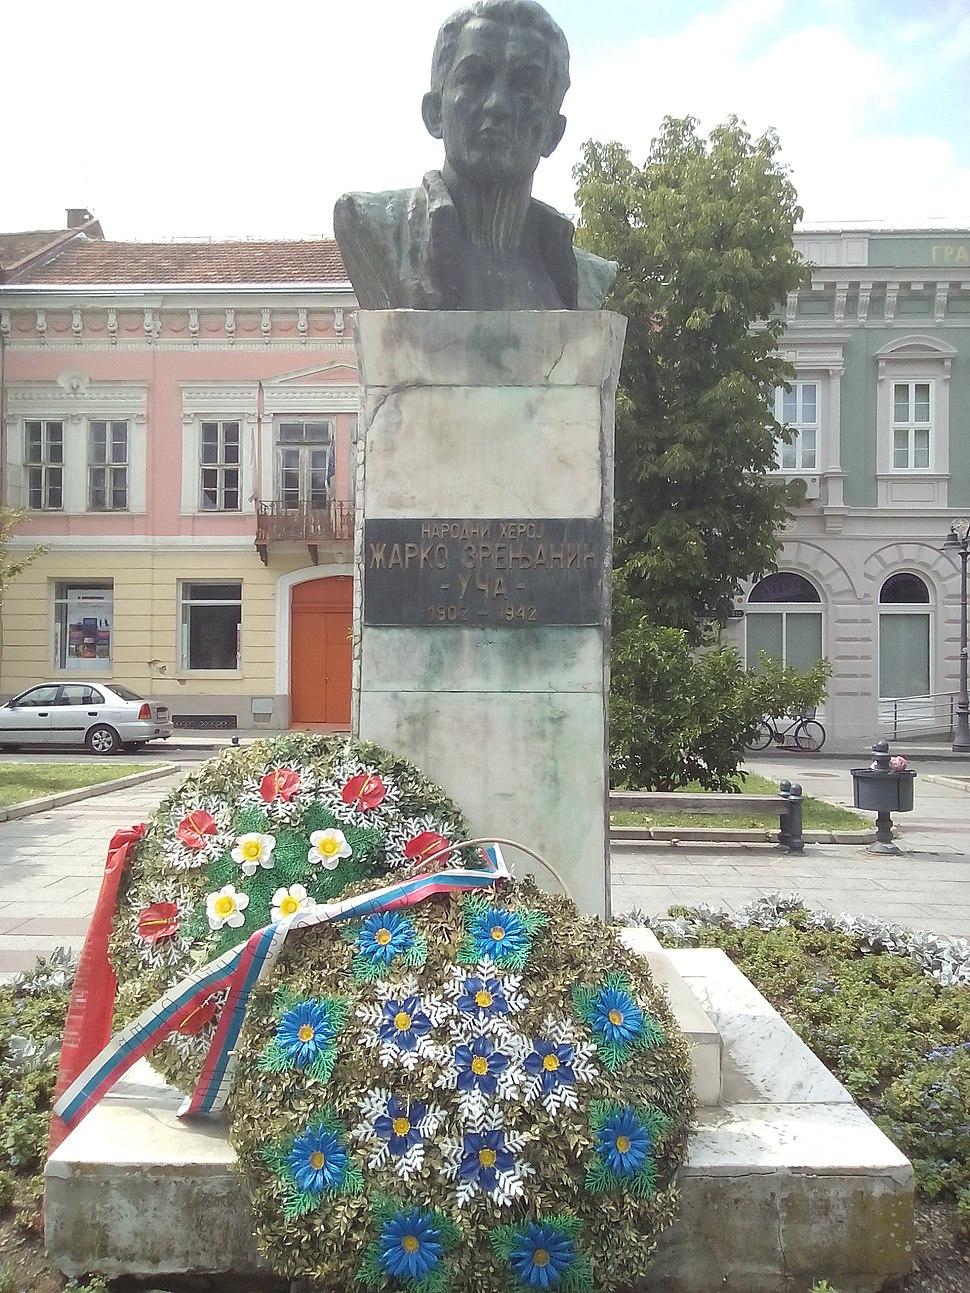 Žarko Zrenjanin monument in Vršac - Споменик Жарку Зрењанину у Вршцу